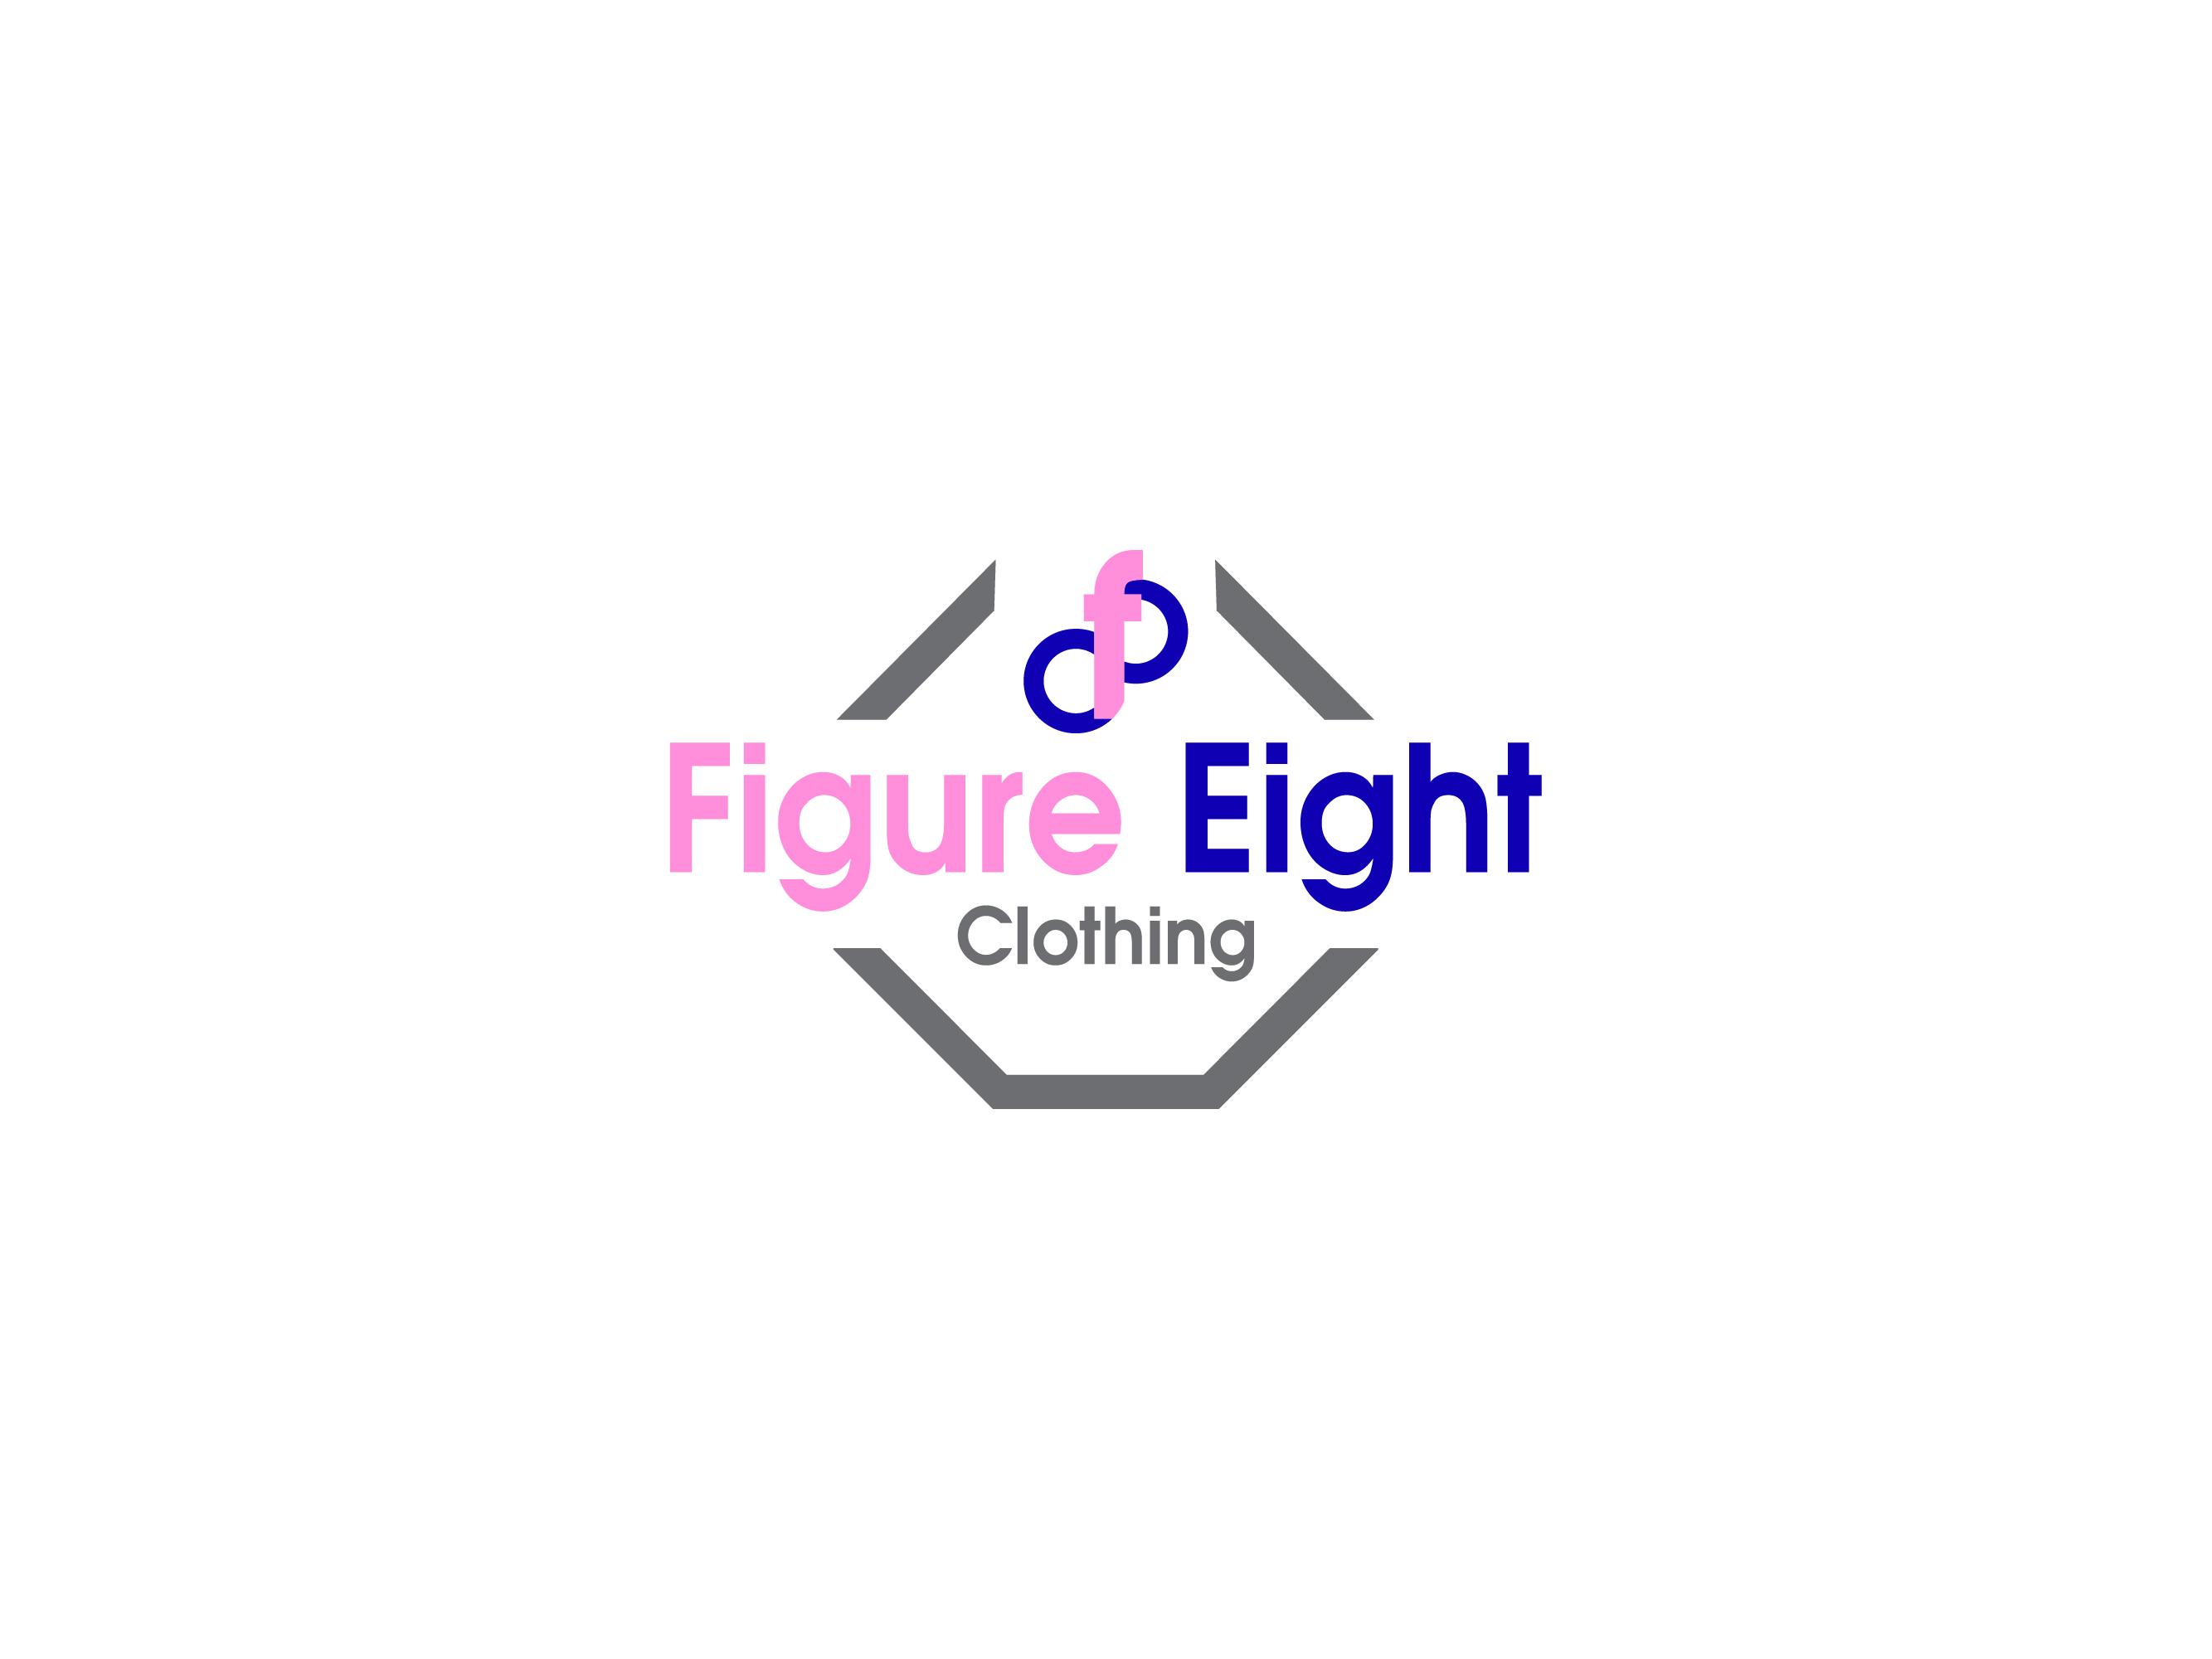 Logo Design by iRishi - Entry No. 87 in the Logo Design Contest Artistic Logo Design for Figure Eight Clothing.